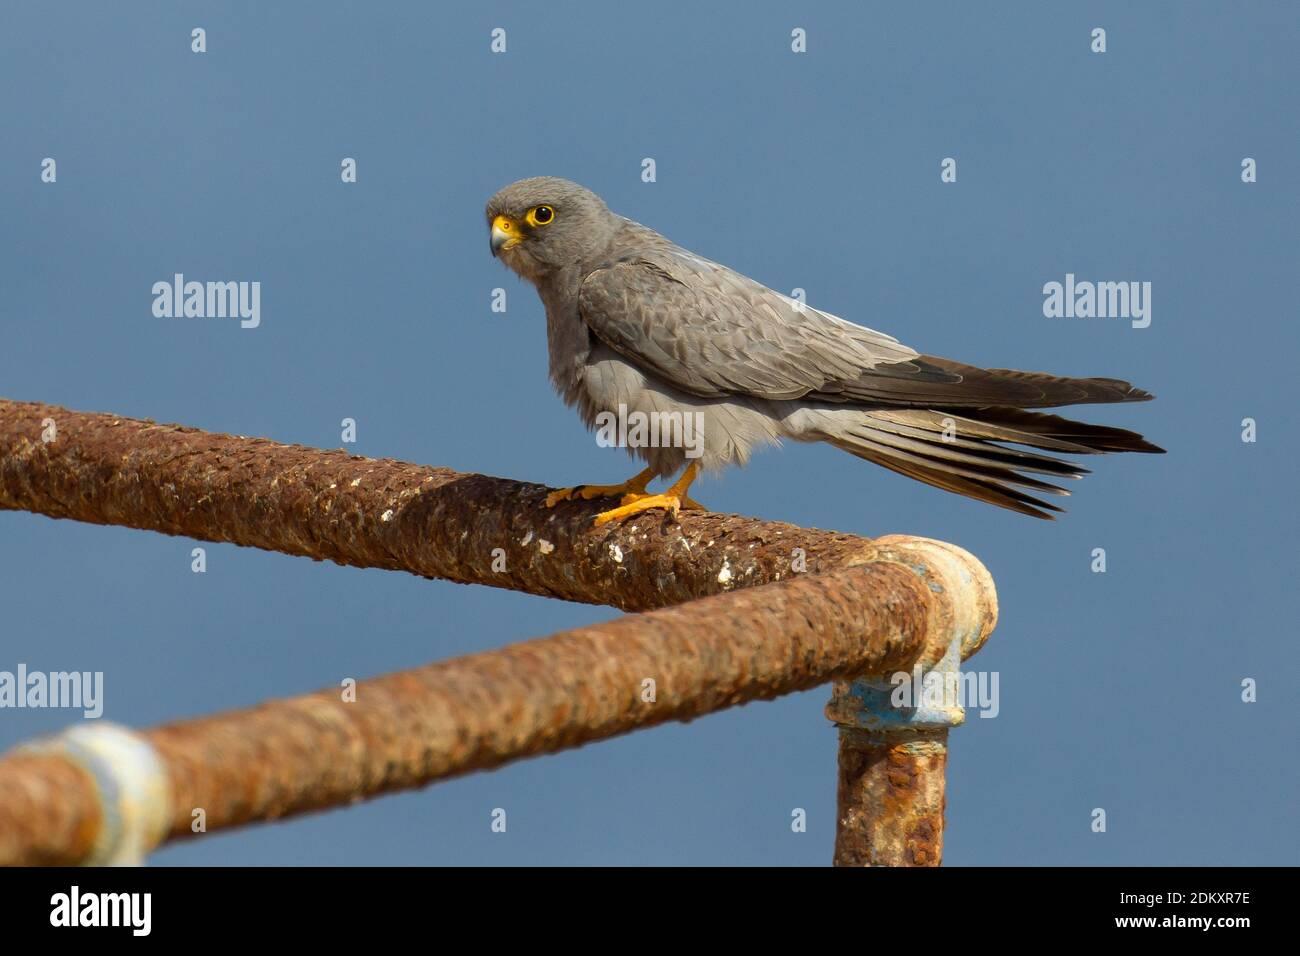 Woestijnvalk zittend op scheepswrak; Sooty Falcon perched on ship wreck Stock Photo